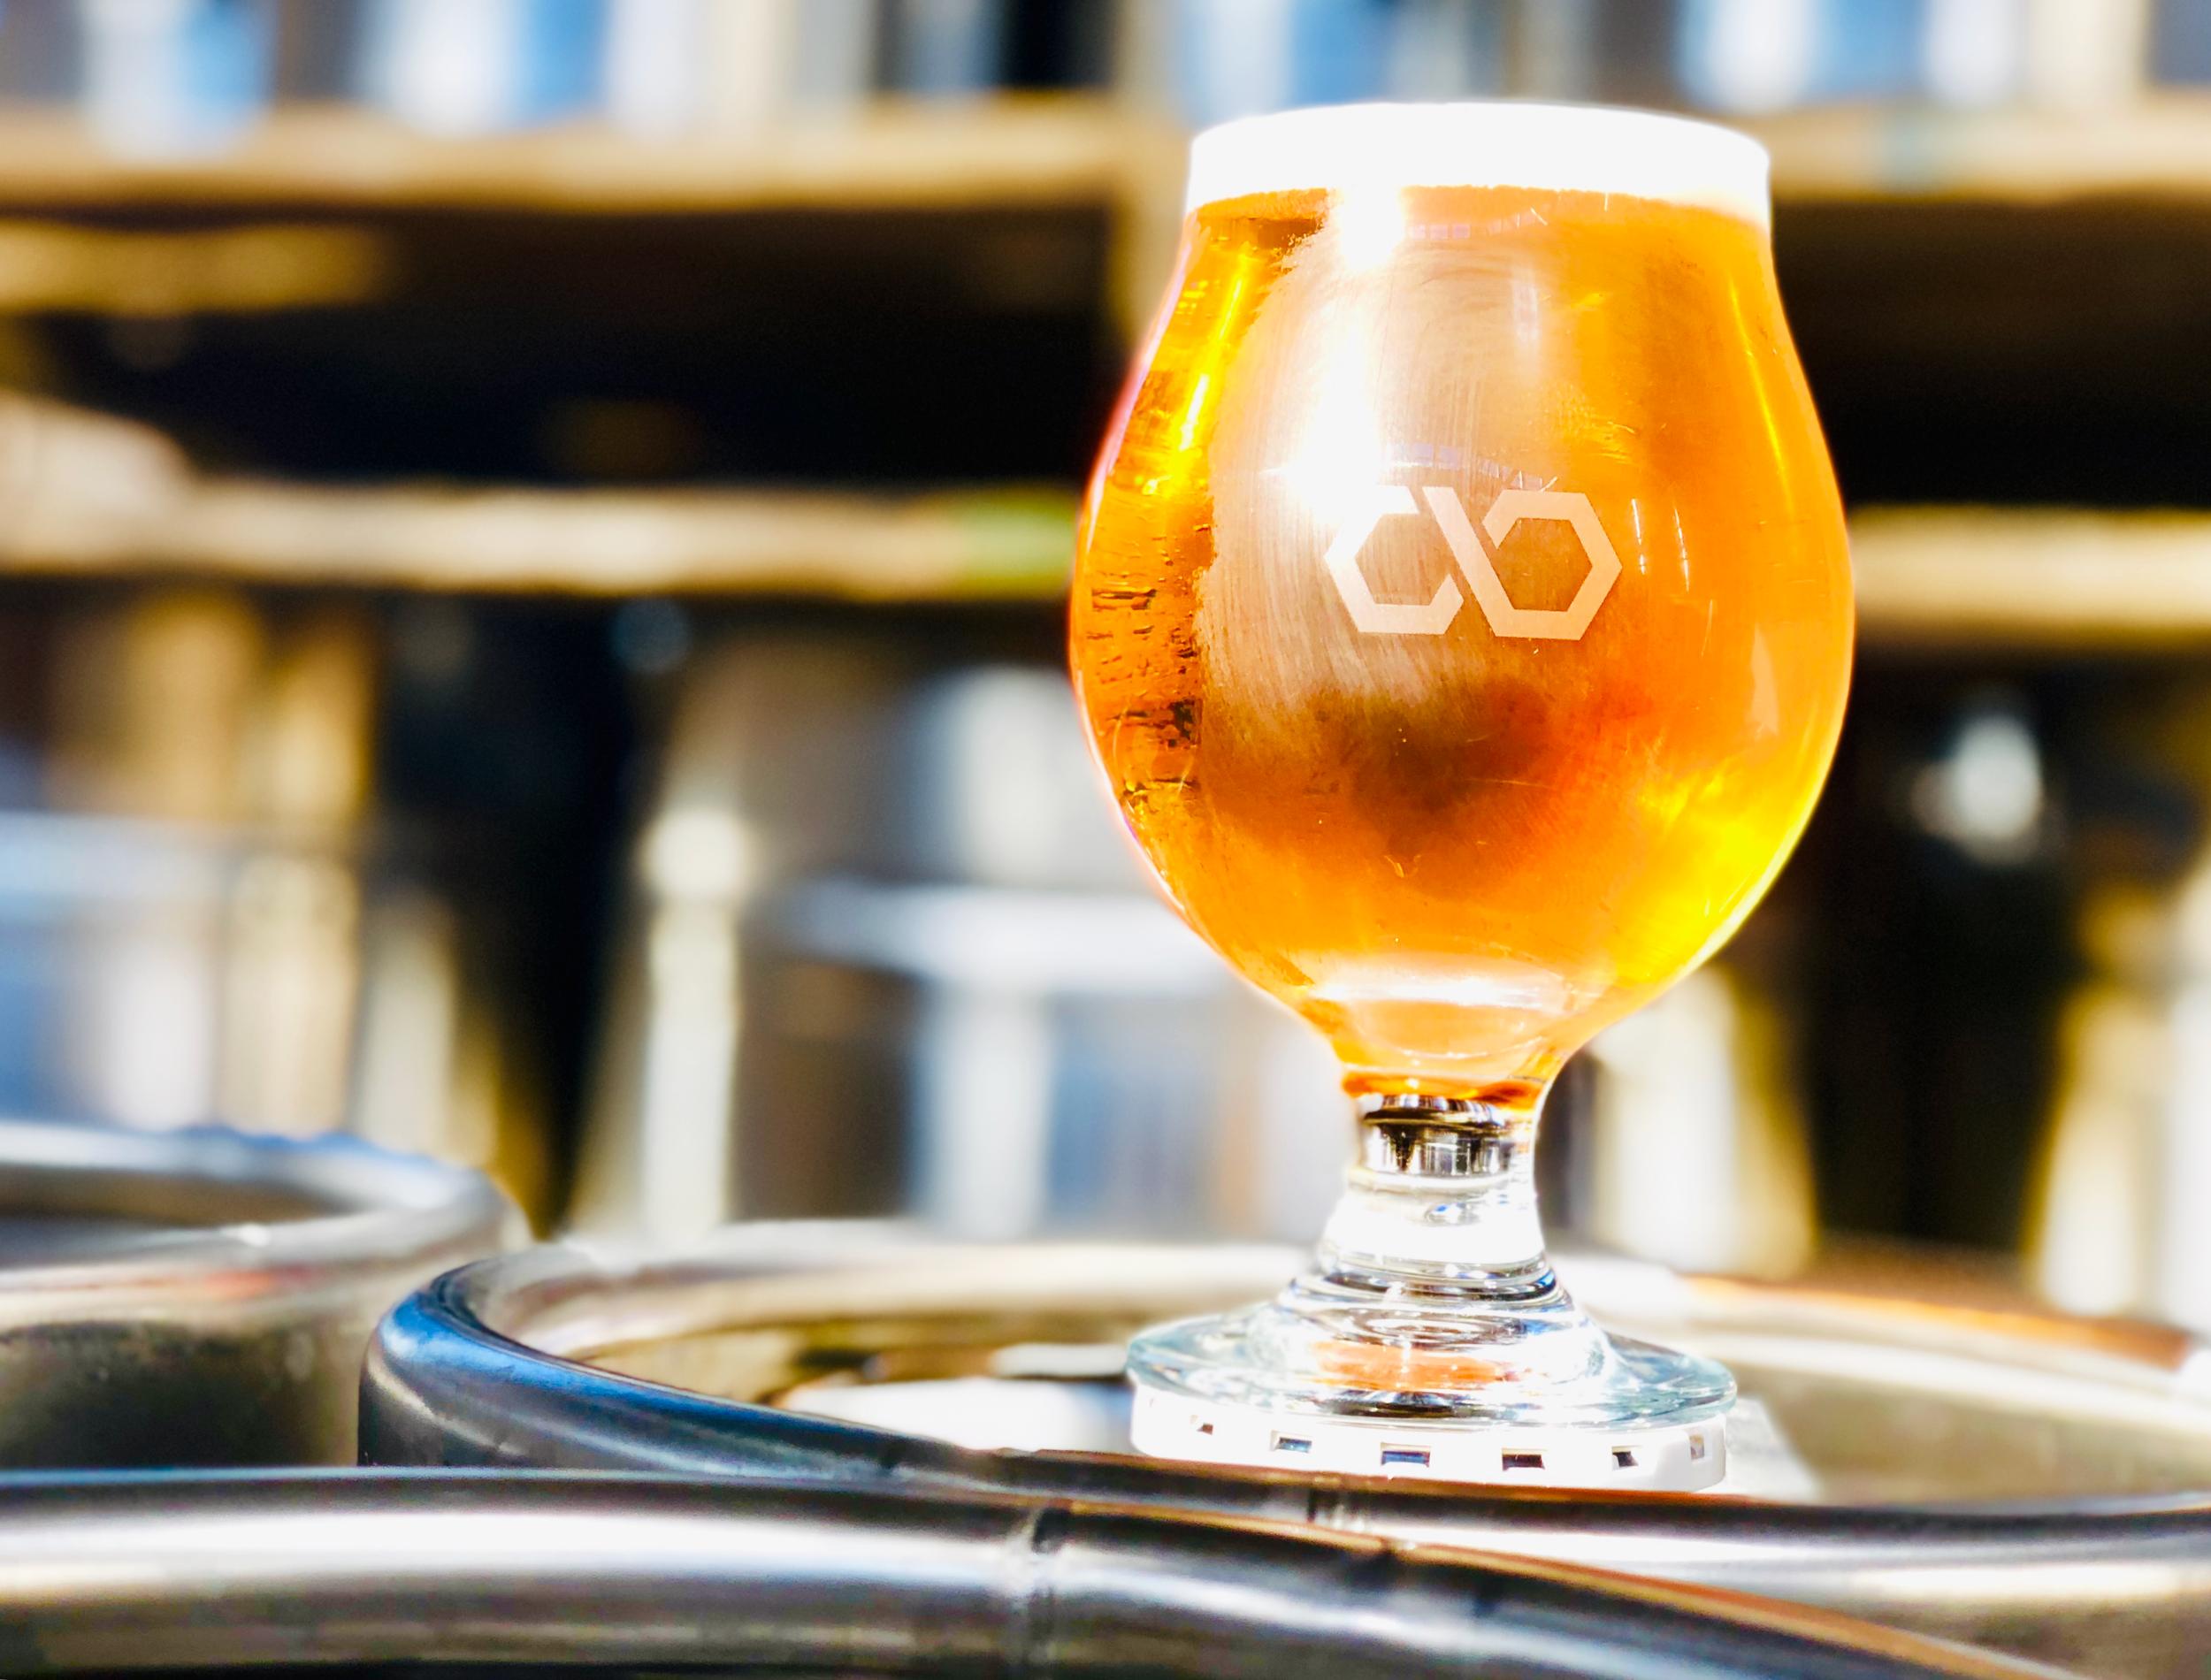 belgian-tripel-common-bond-brewers.png